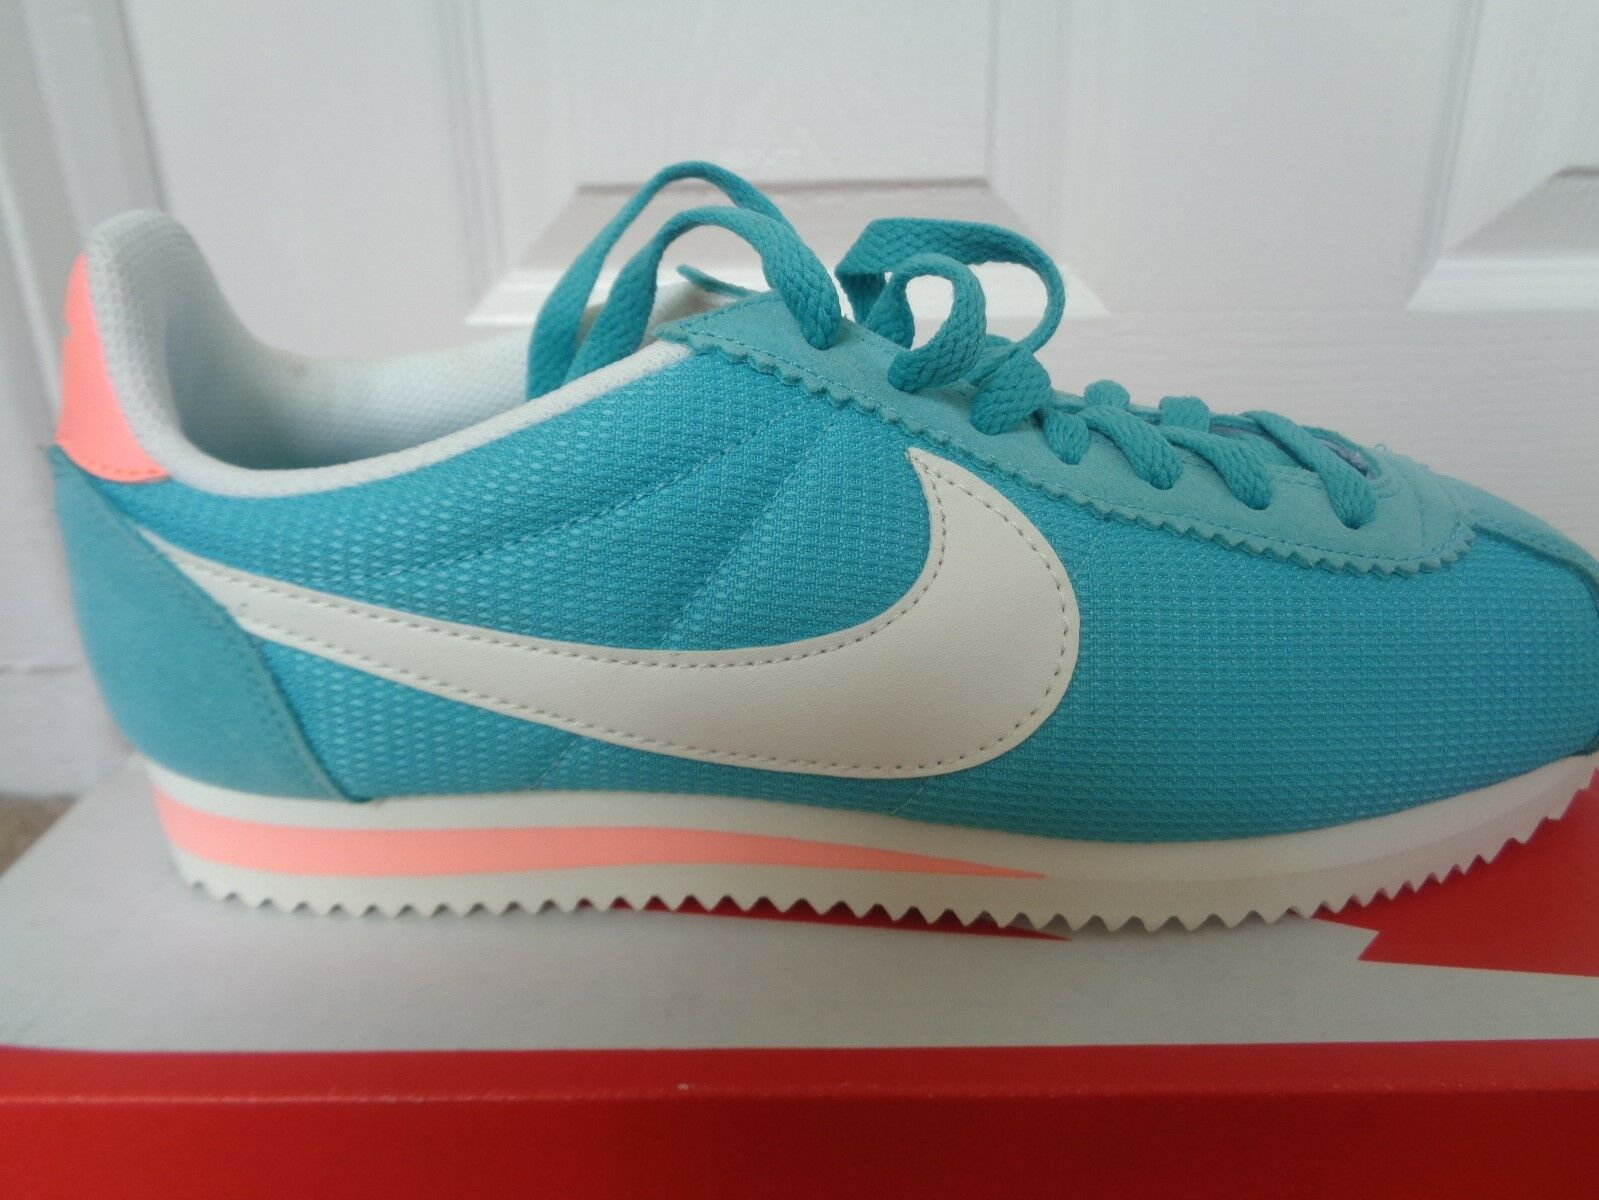 Nike Classic Cortez wmns trainers shoes 844892 310 uk 4 eu 37.5 us 6.5 NEW +BOX